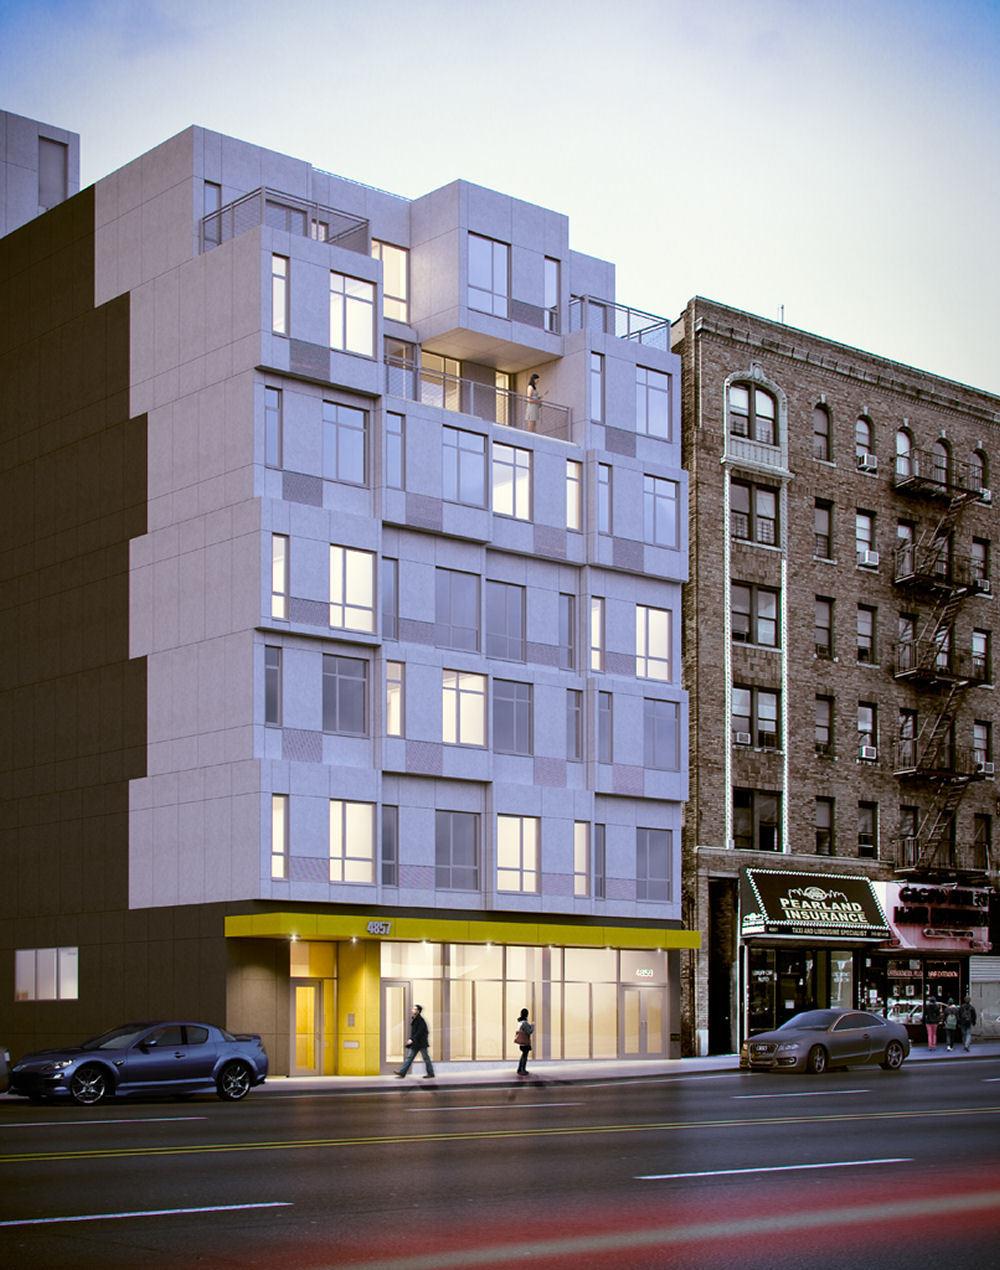 200 East 79th Street